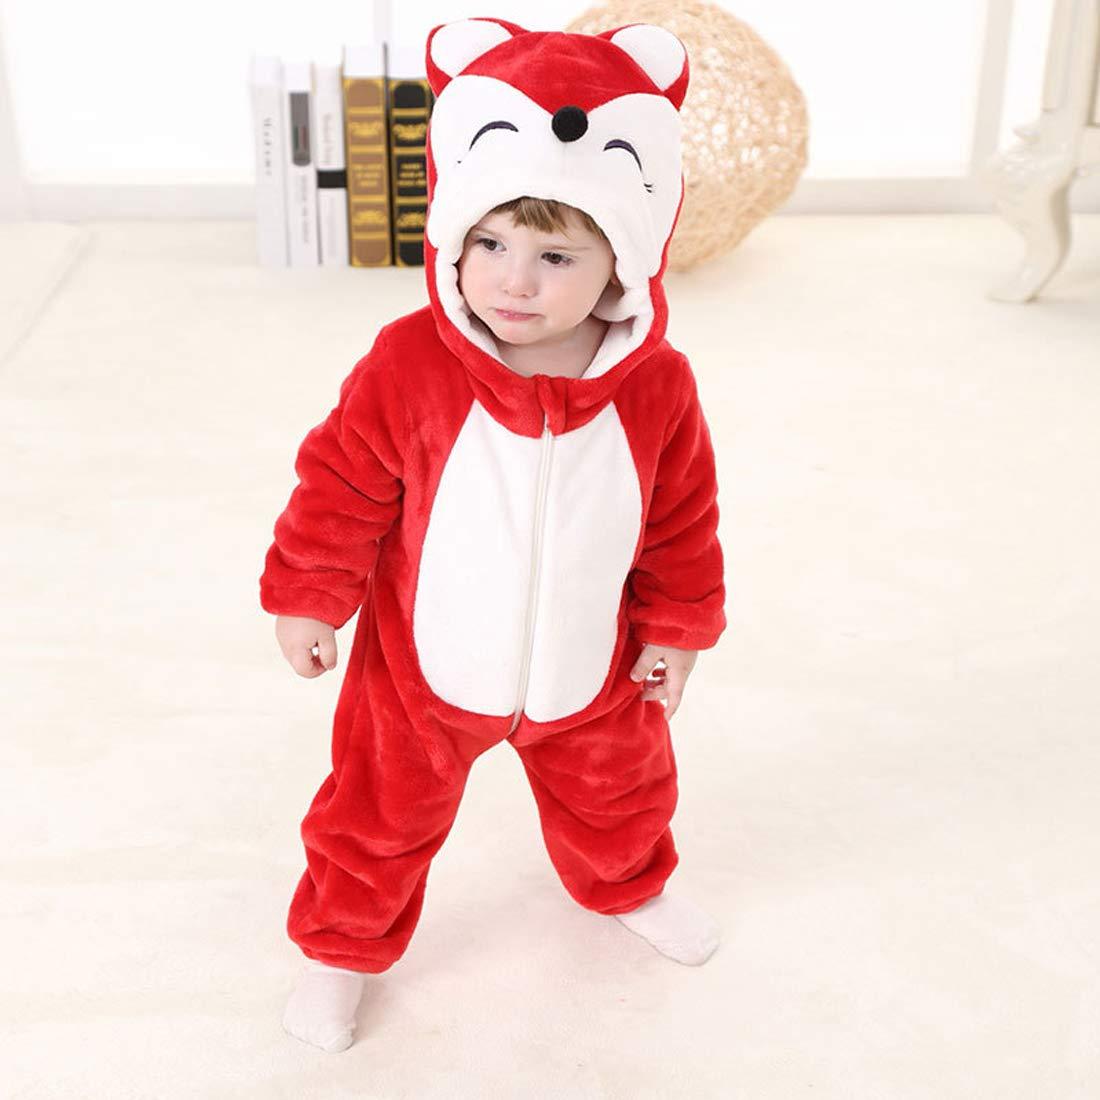 PAUBOLI Fox Costume Infant Red Fox Romper Flannel Onesie Hooded Fox Halloween Costume